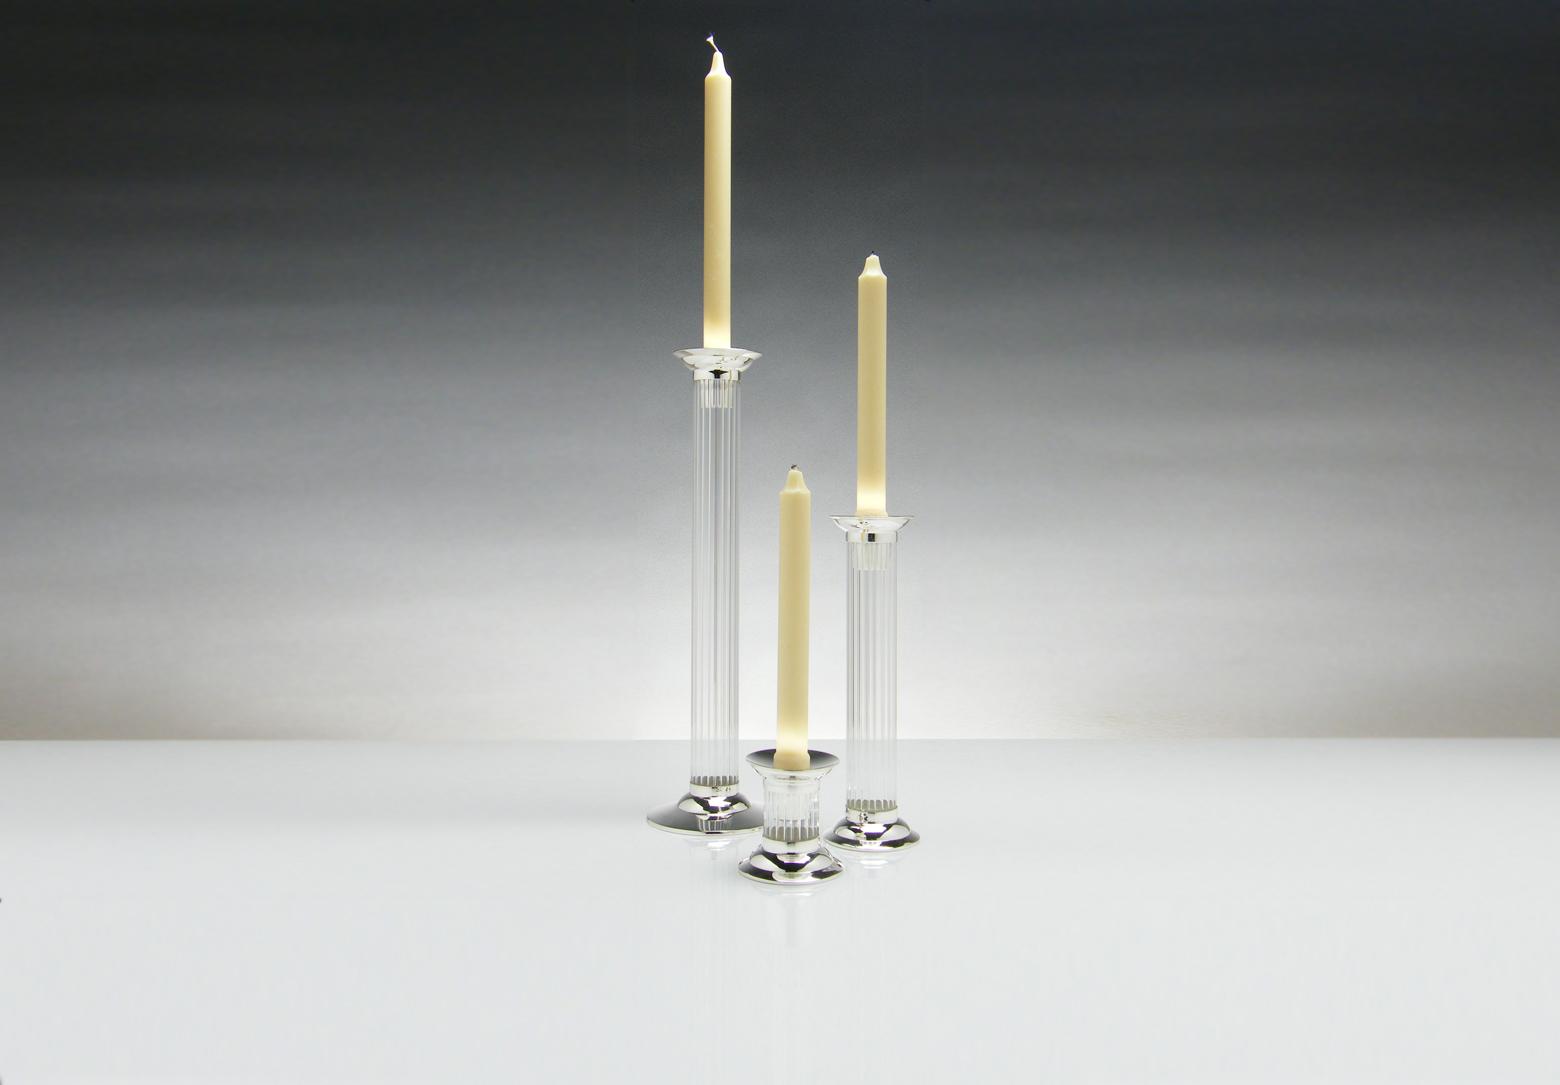 contemporary silverware - flute' group candlesticks contemporary silverware by martyn pugh